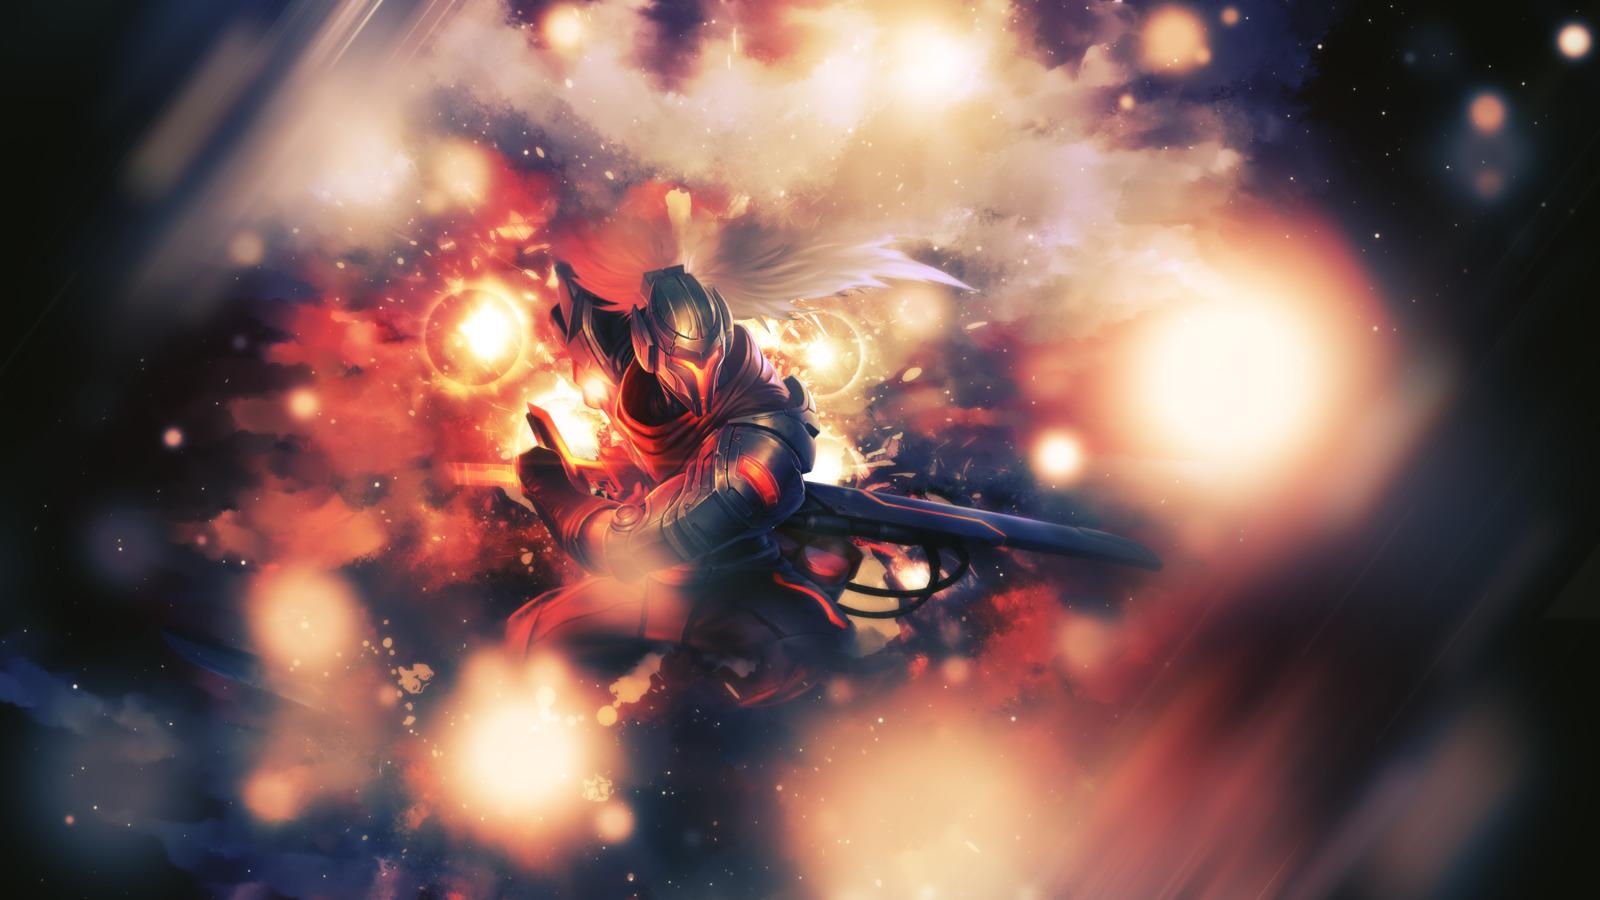 Best 3d Hd Wallpapers Download League Of Legends Yasuo Wallpapers Hd Desktop And